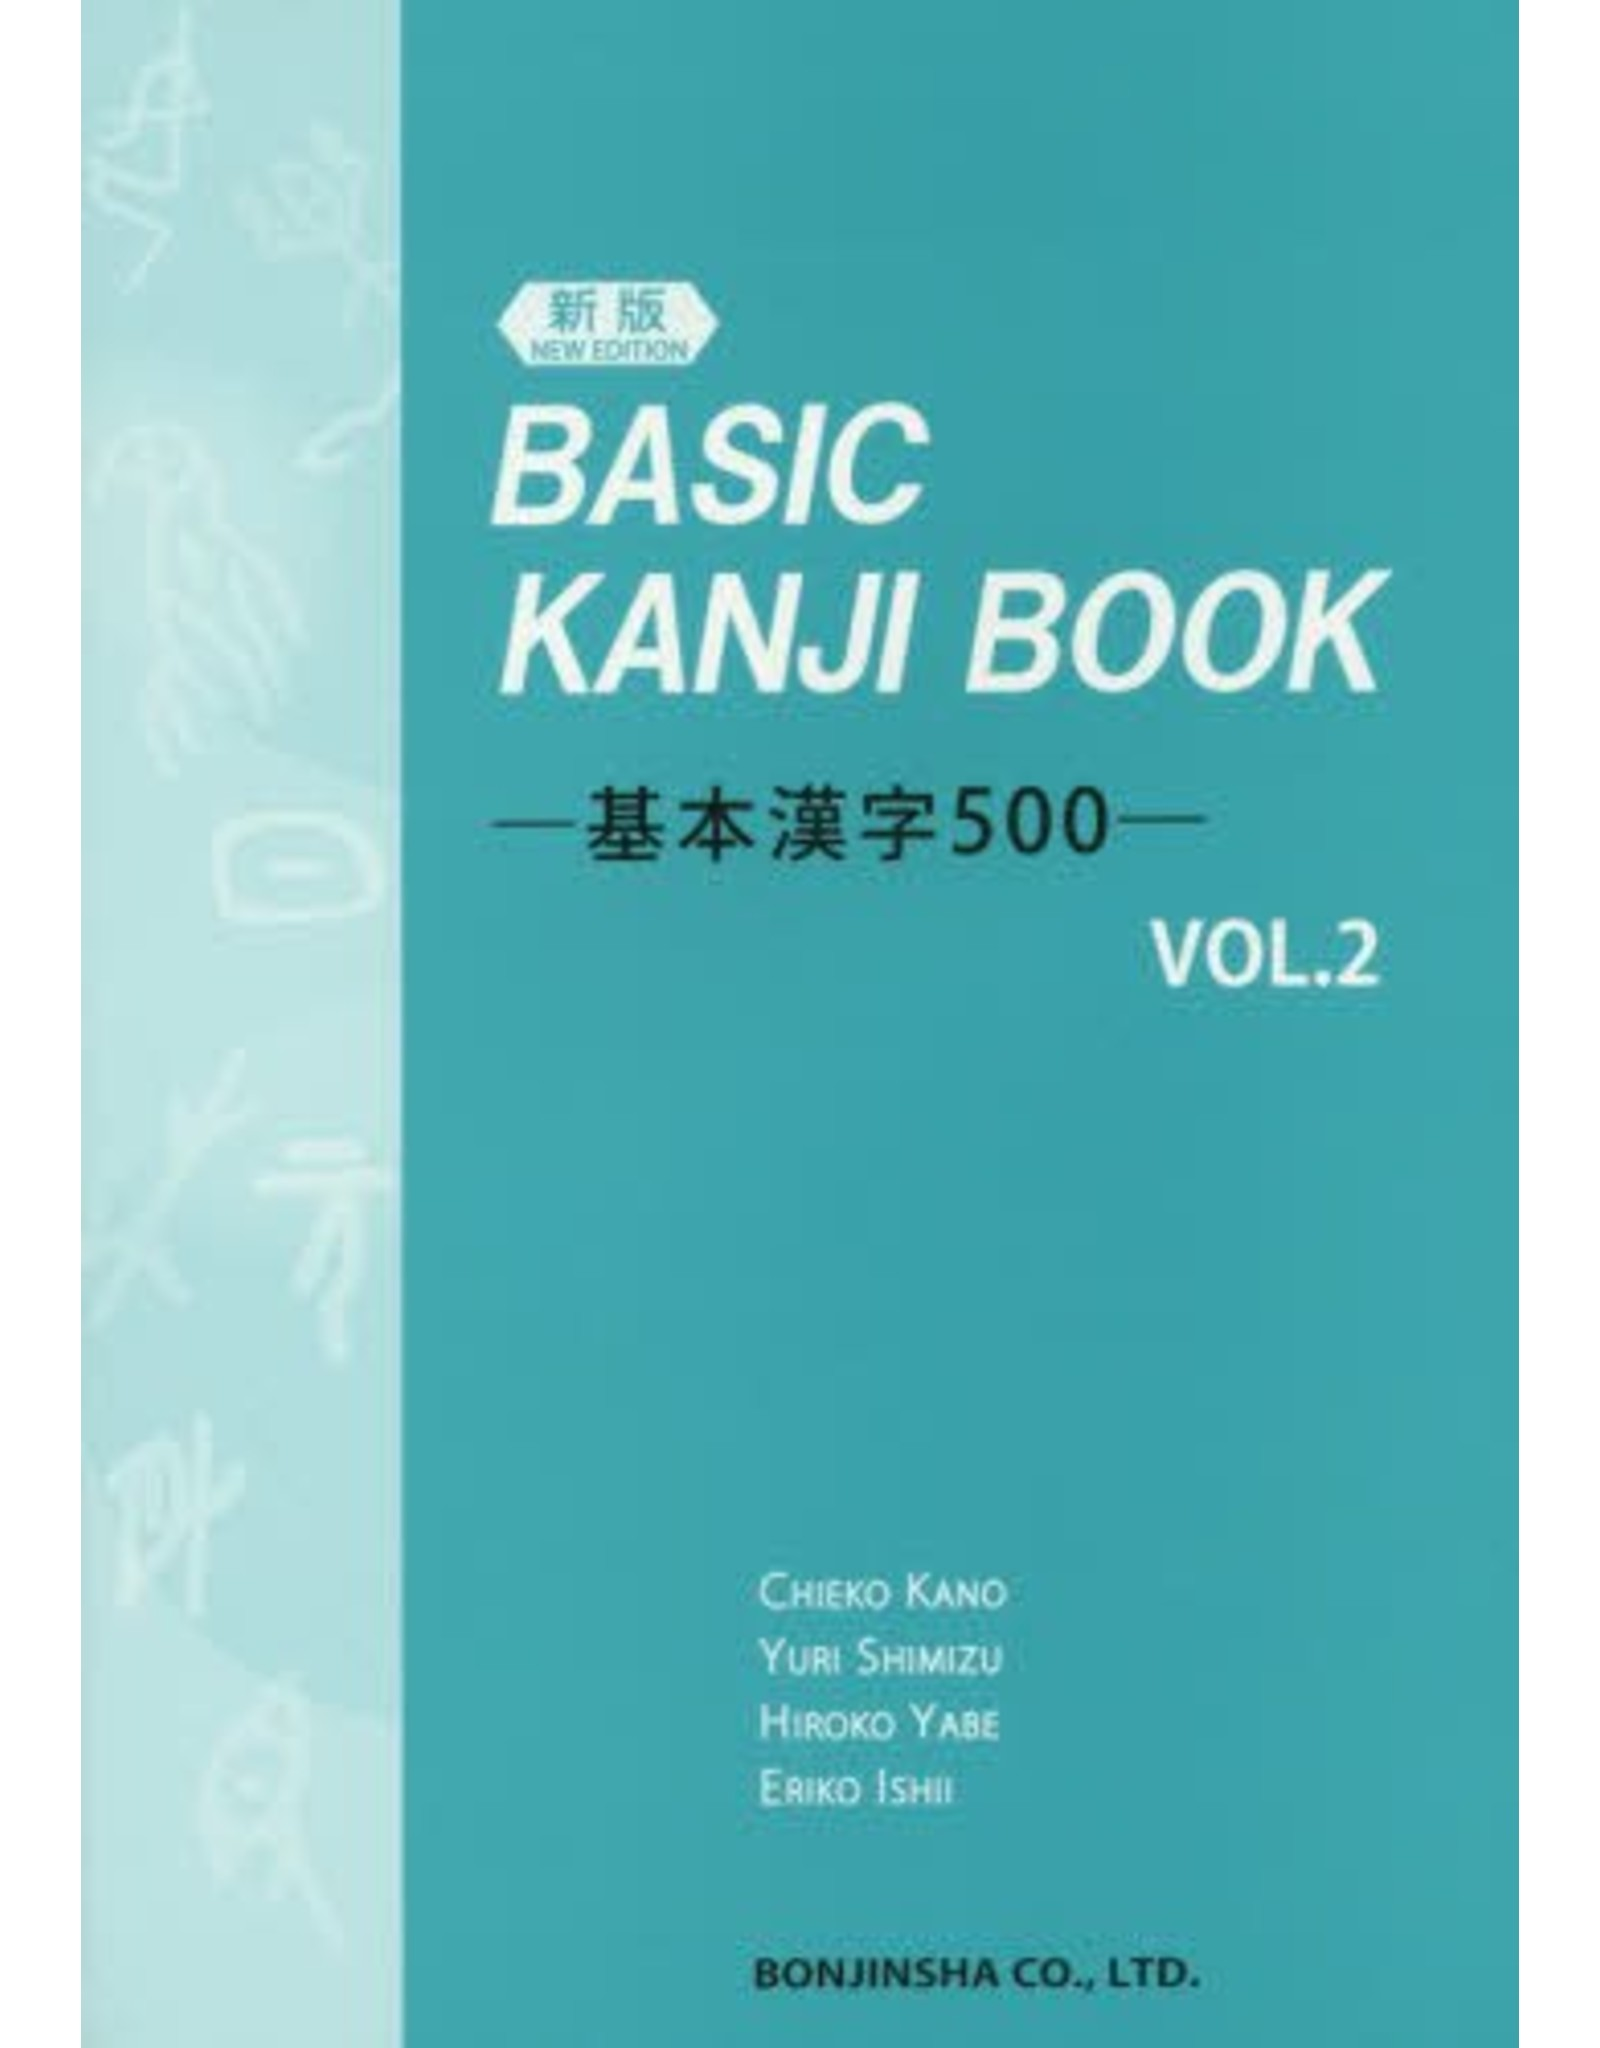 BONJINSHA BASIC KANJI BOOK 500 VOL.2